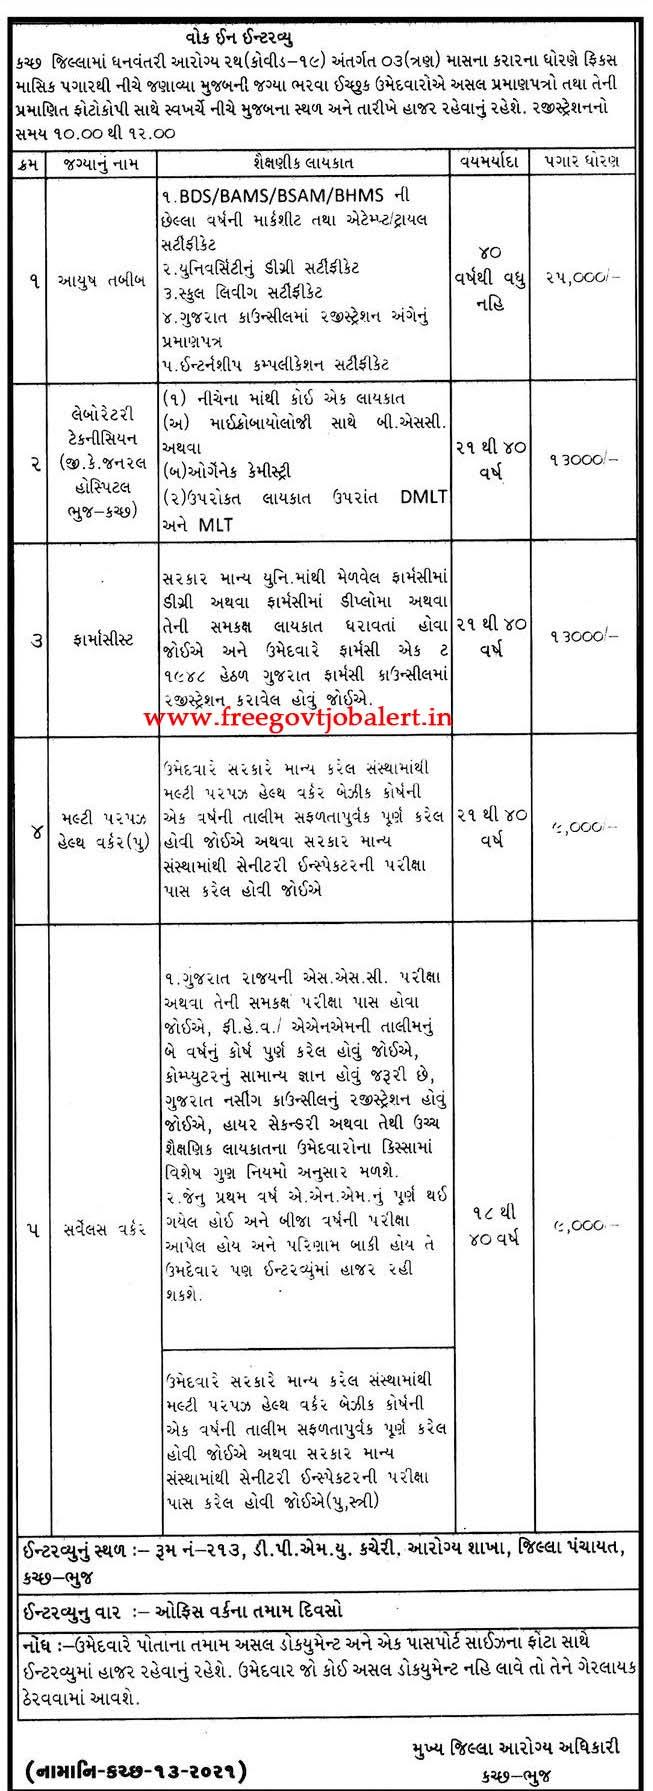 Kutch-Bhuj District Panchayat Recruitment 2021 - MPHW & Other Posts